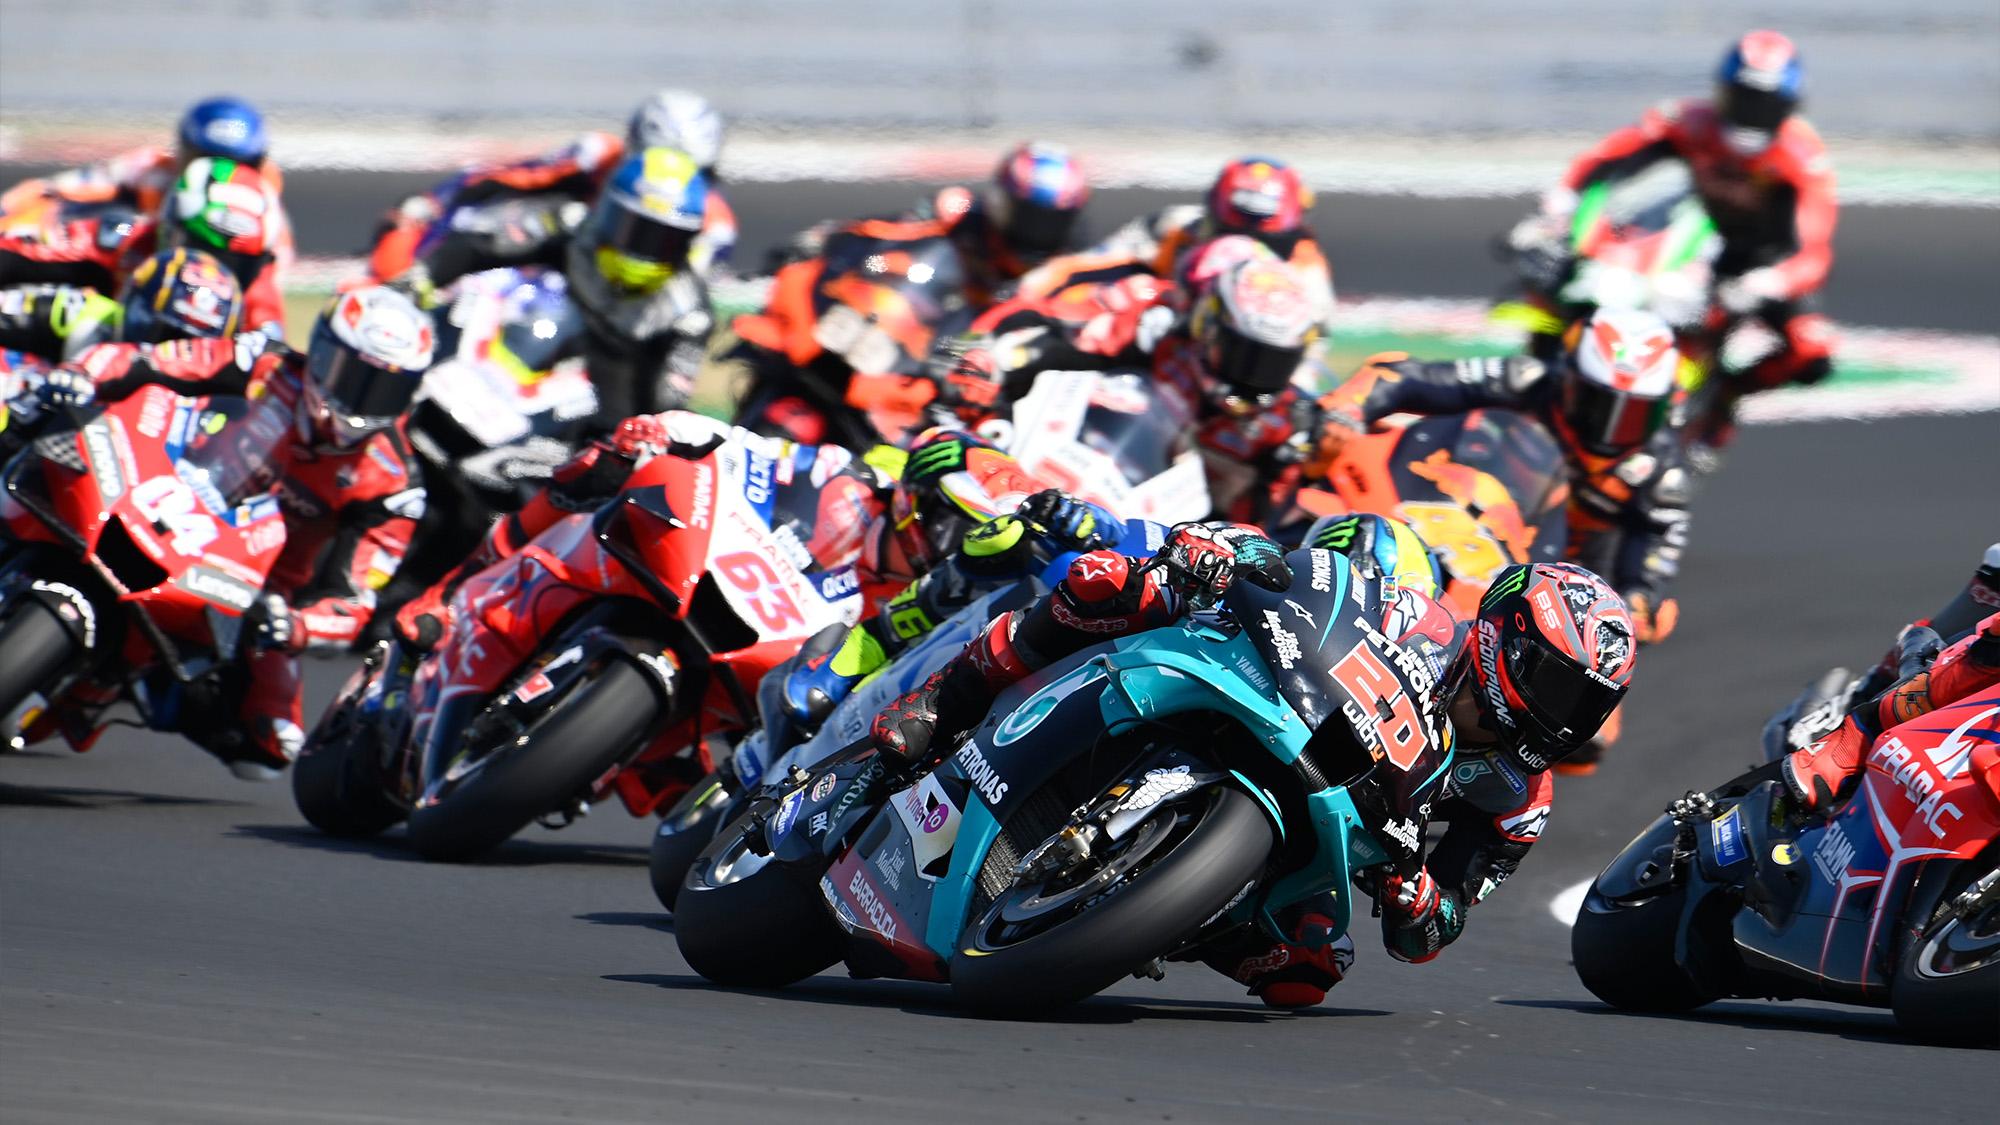 Fabio Quartararo fighting during the 2020 MotoGP San Marino Grand Prix at Misano